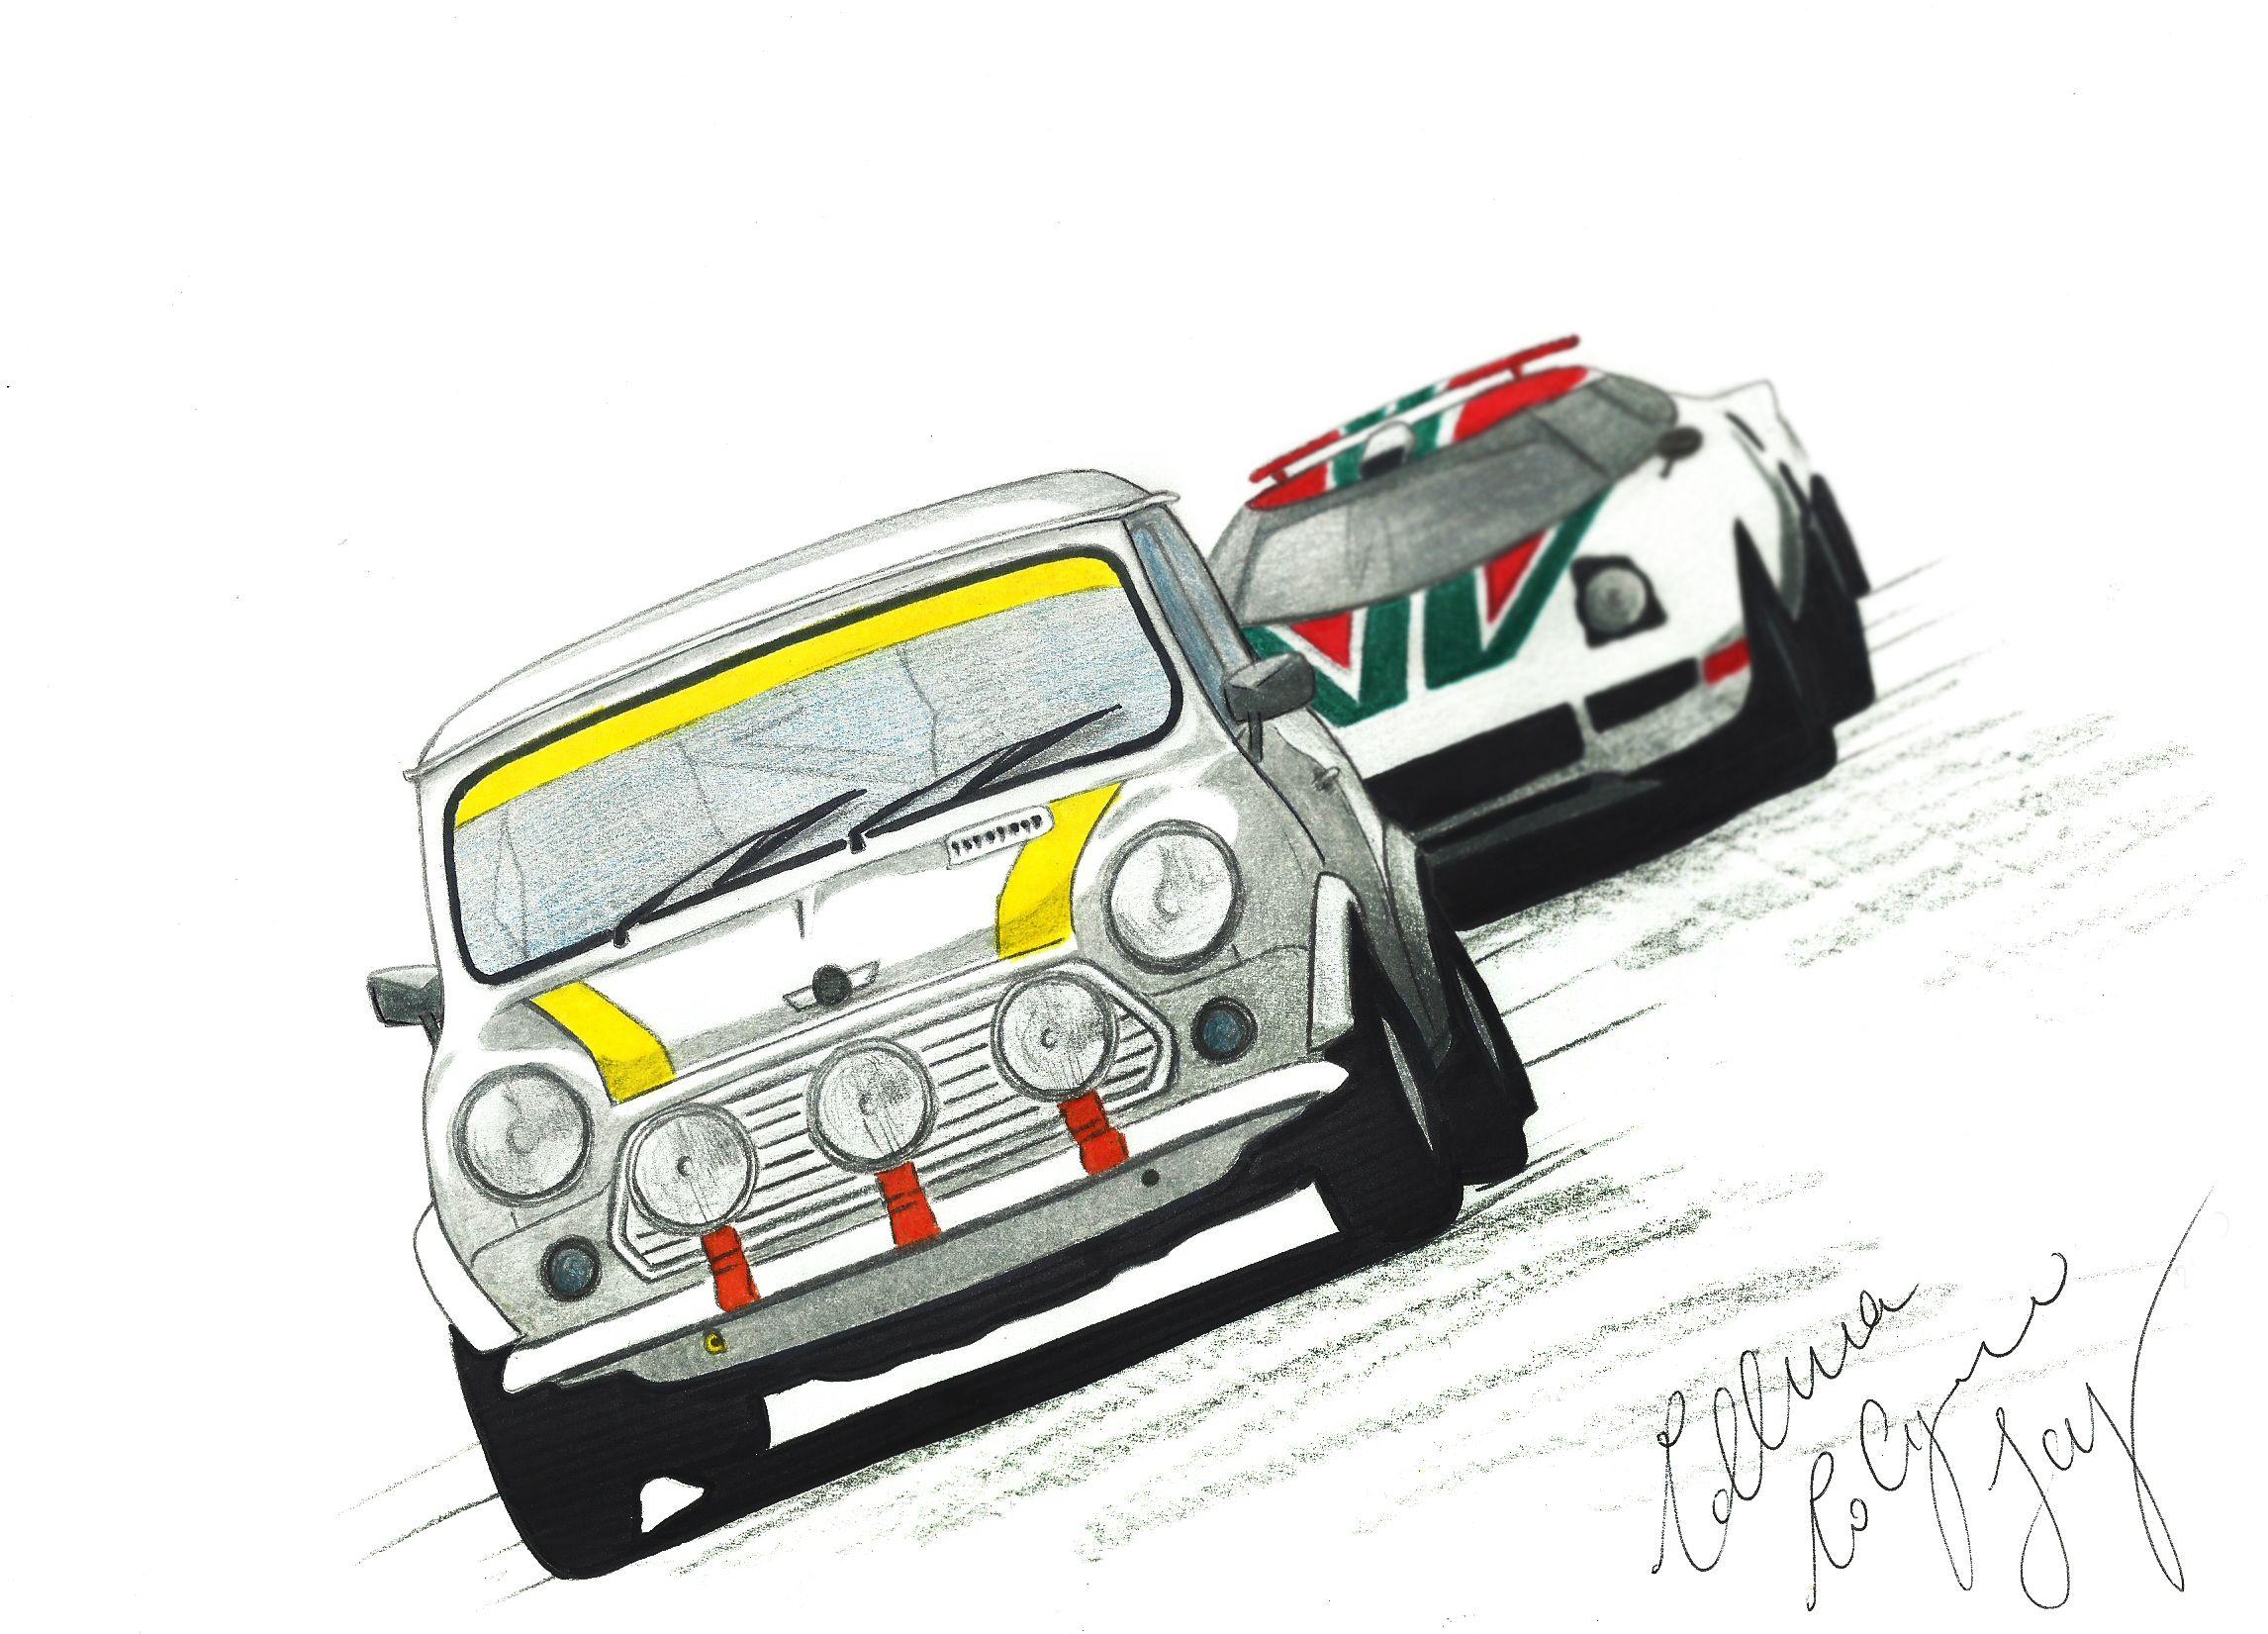 #SketchCar #Mini #miniclassic #minirally #rally #rallye #competition #rallycompetition #sport #sportrally #smallcar #sportacar #smallrally #fastcar #minirover #vintagecar #car #oldcar #sketch #Collurasketch